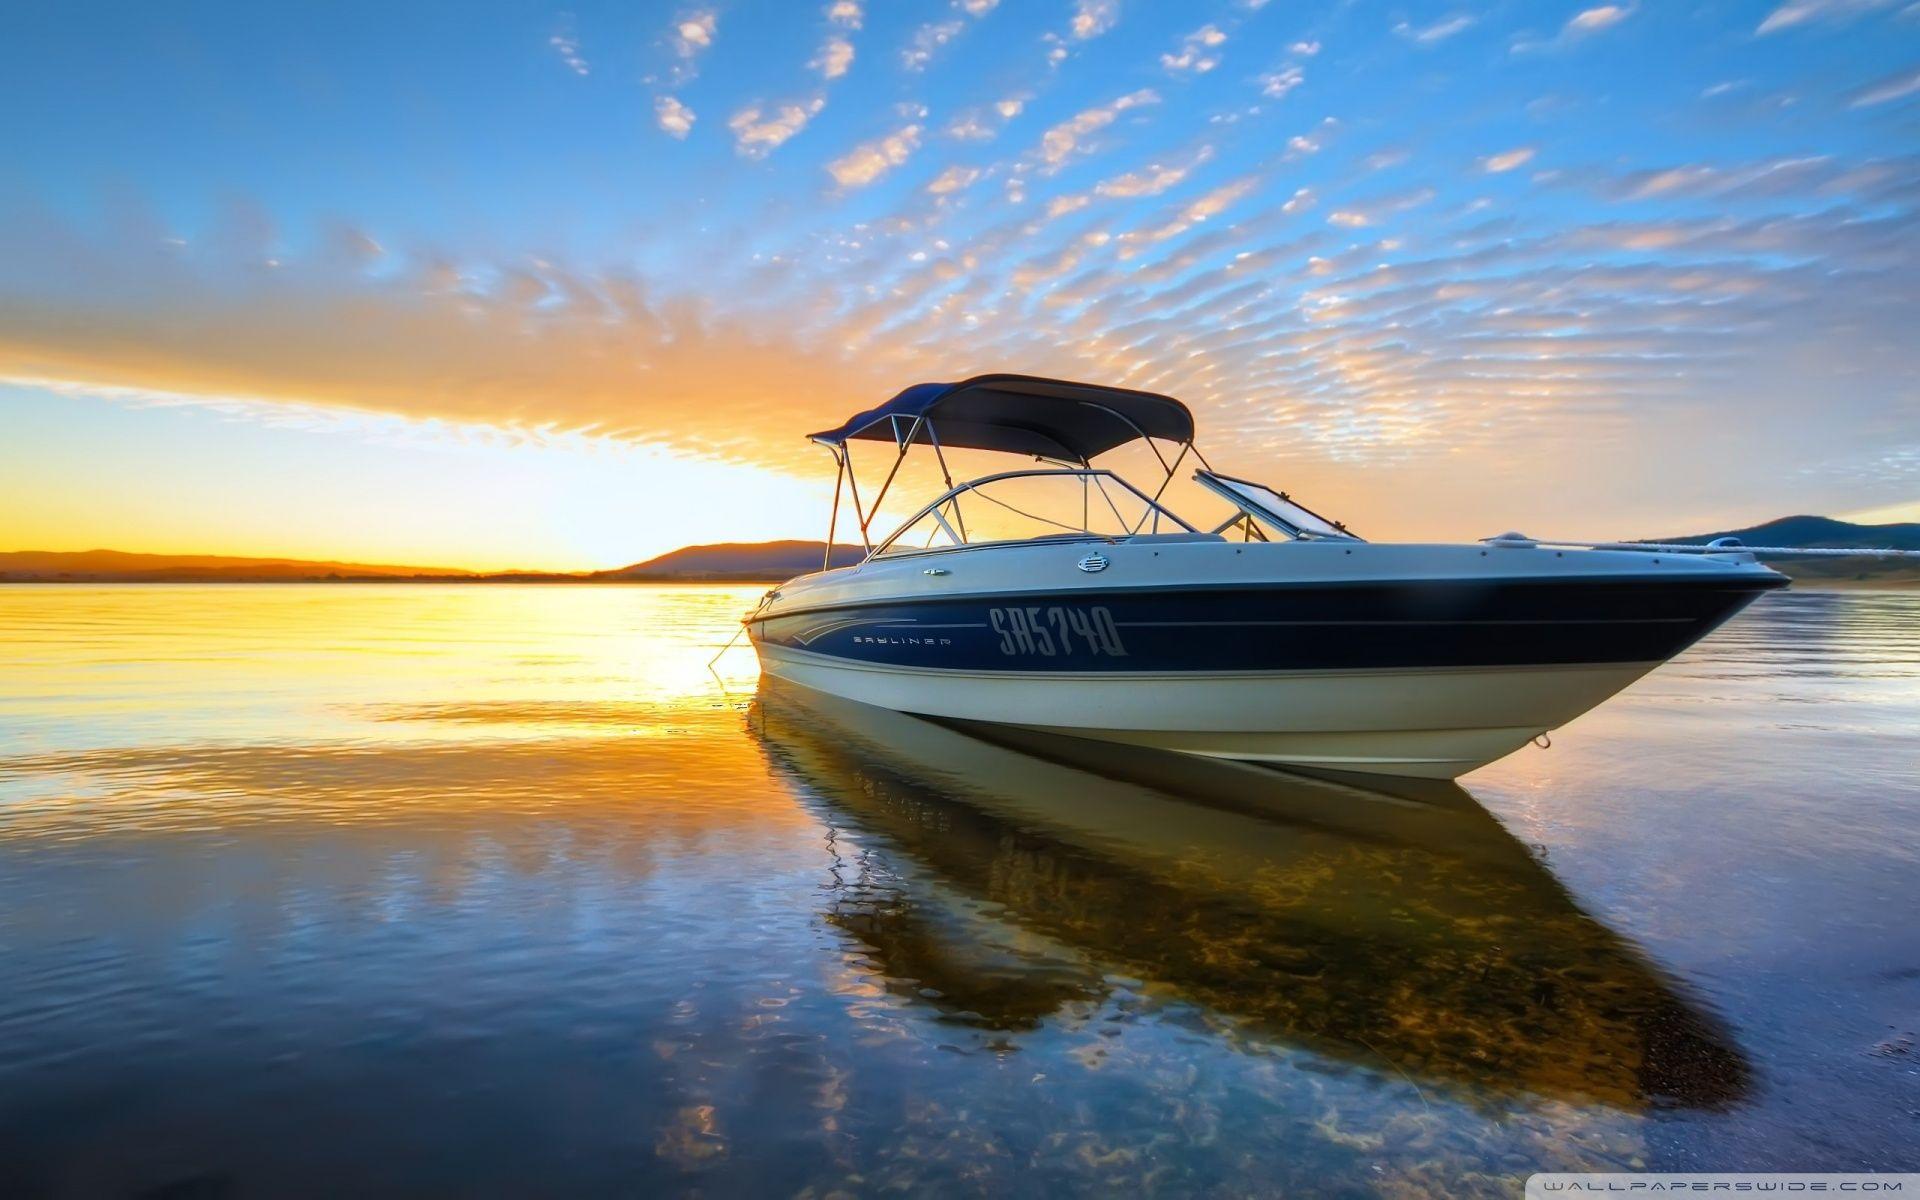 Speed Motor Boat Hd Desktop Wallpaper High Definition With